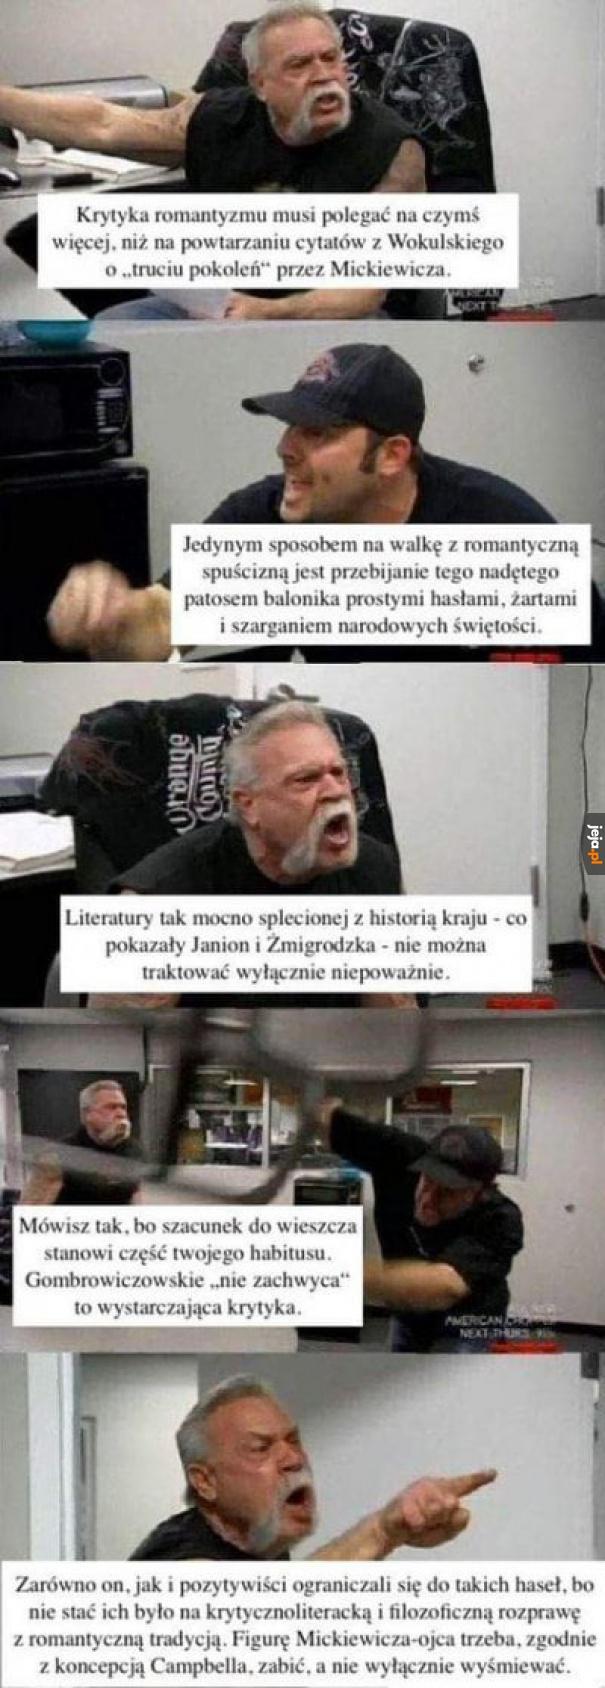 Dysputy o literaturze